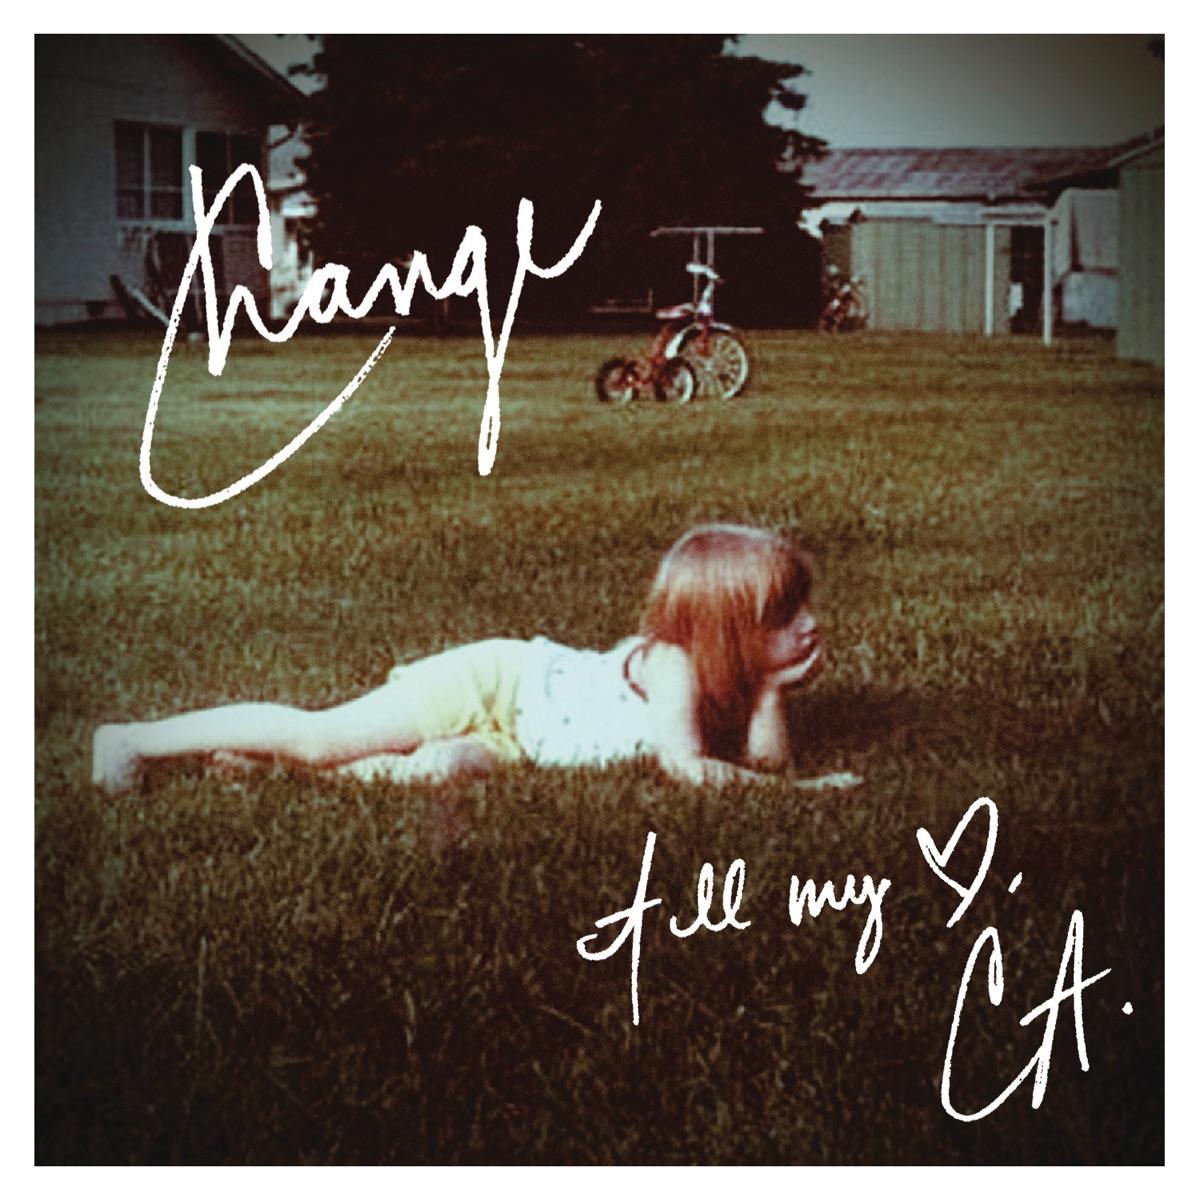 Christina Aguilera Christmas Album.Change Single Album Cover By Christina Aguilera